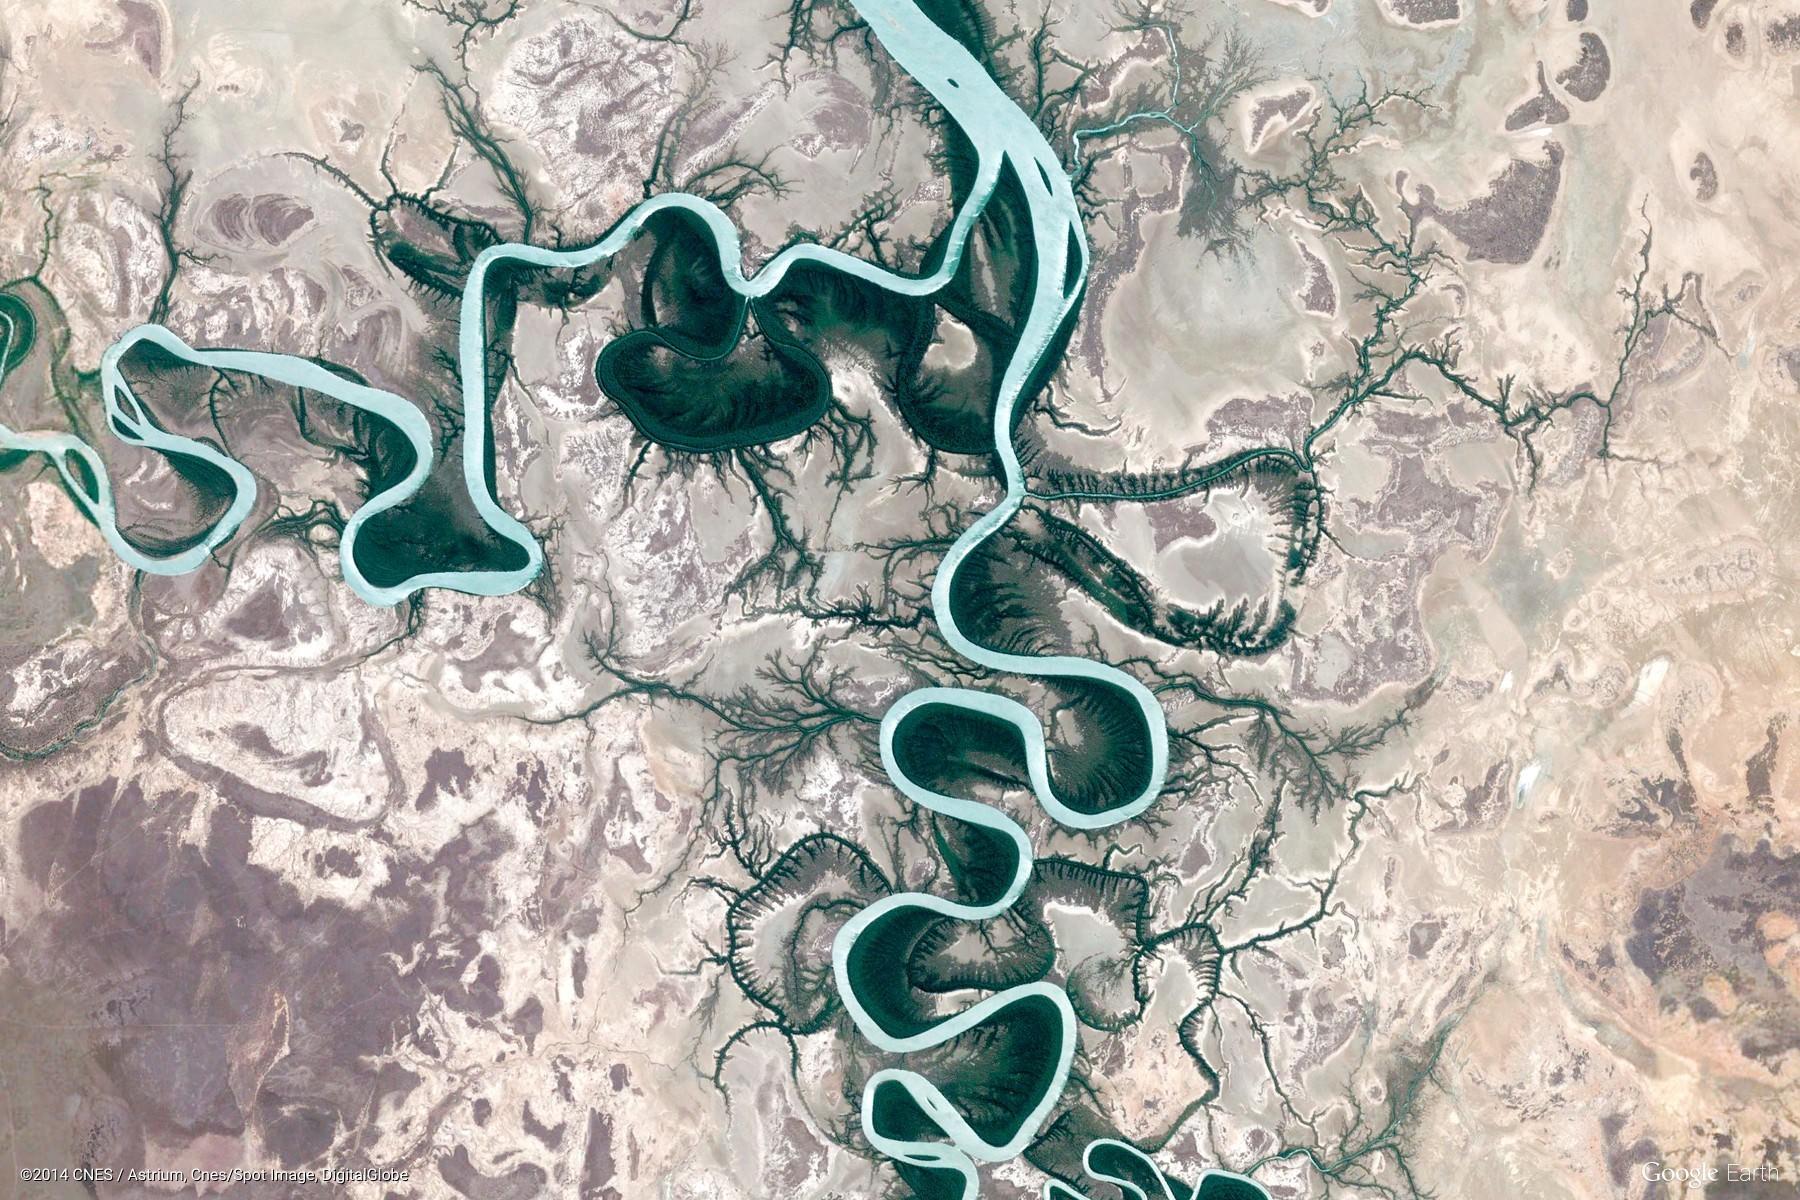 Burketown, Australia (Google Earth View 2385)